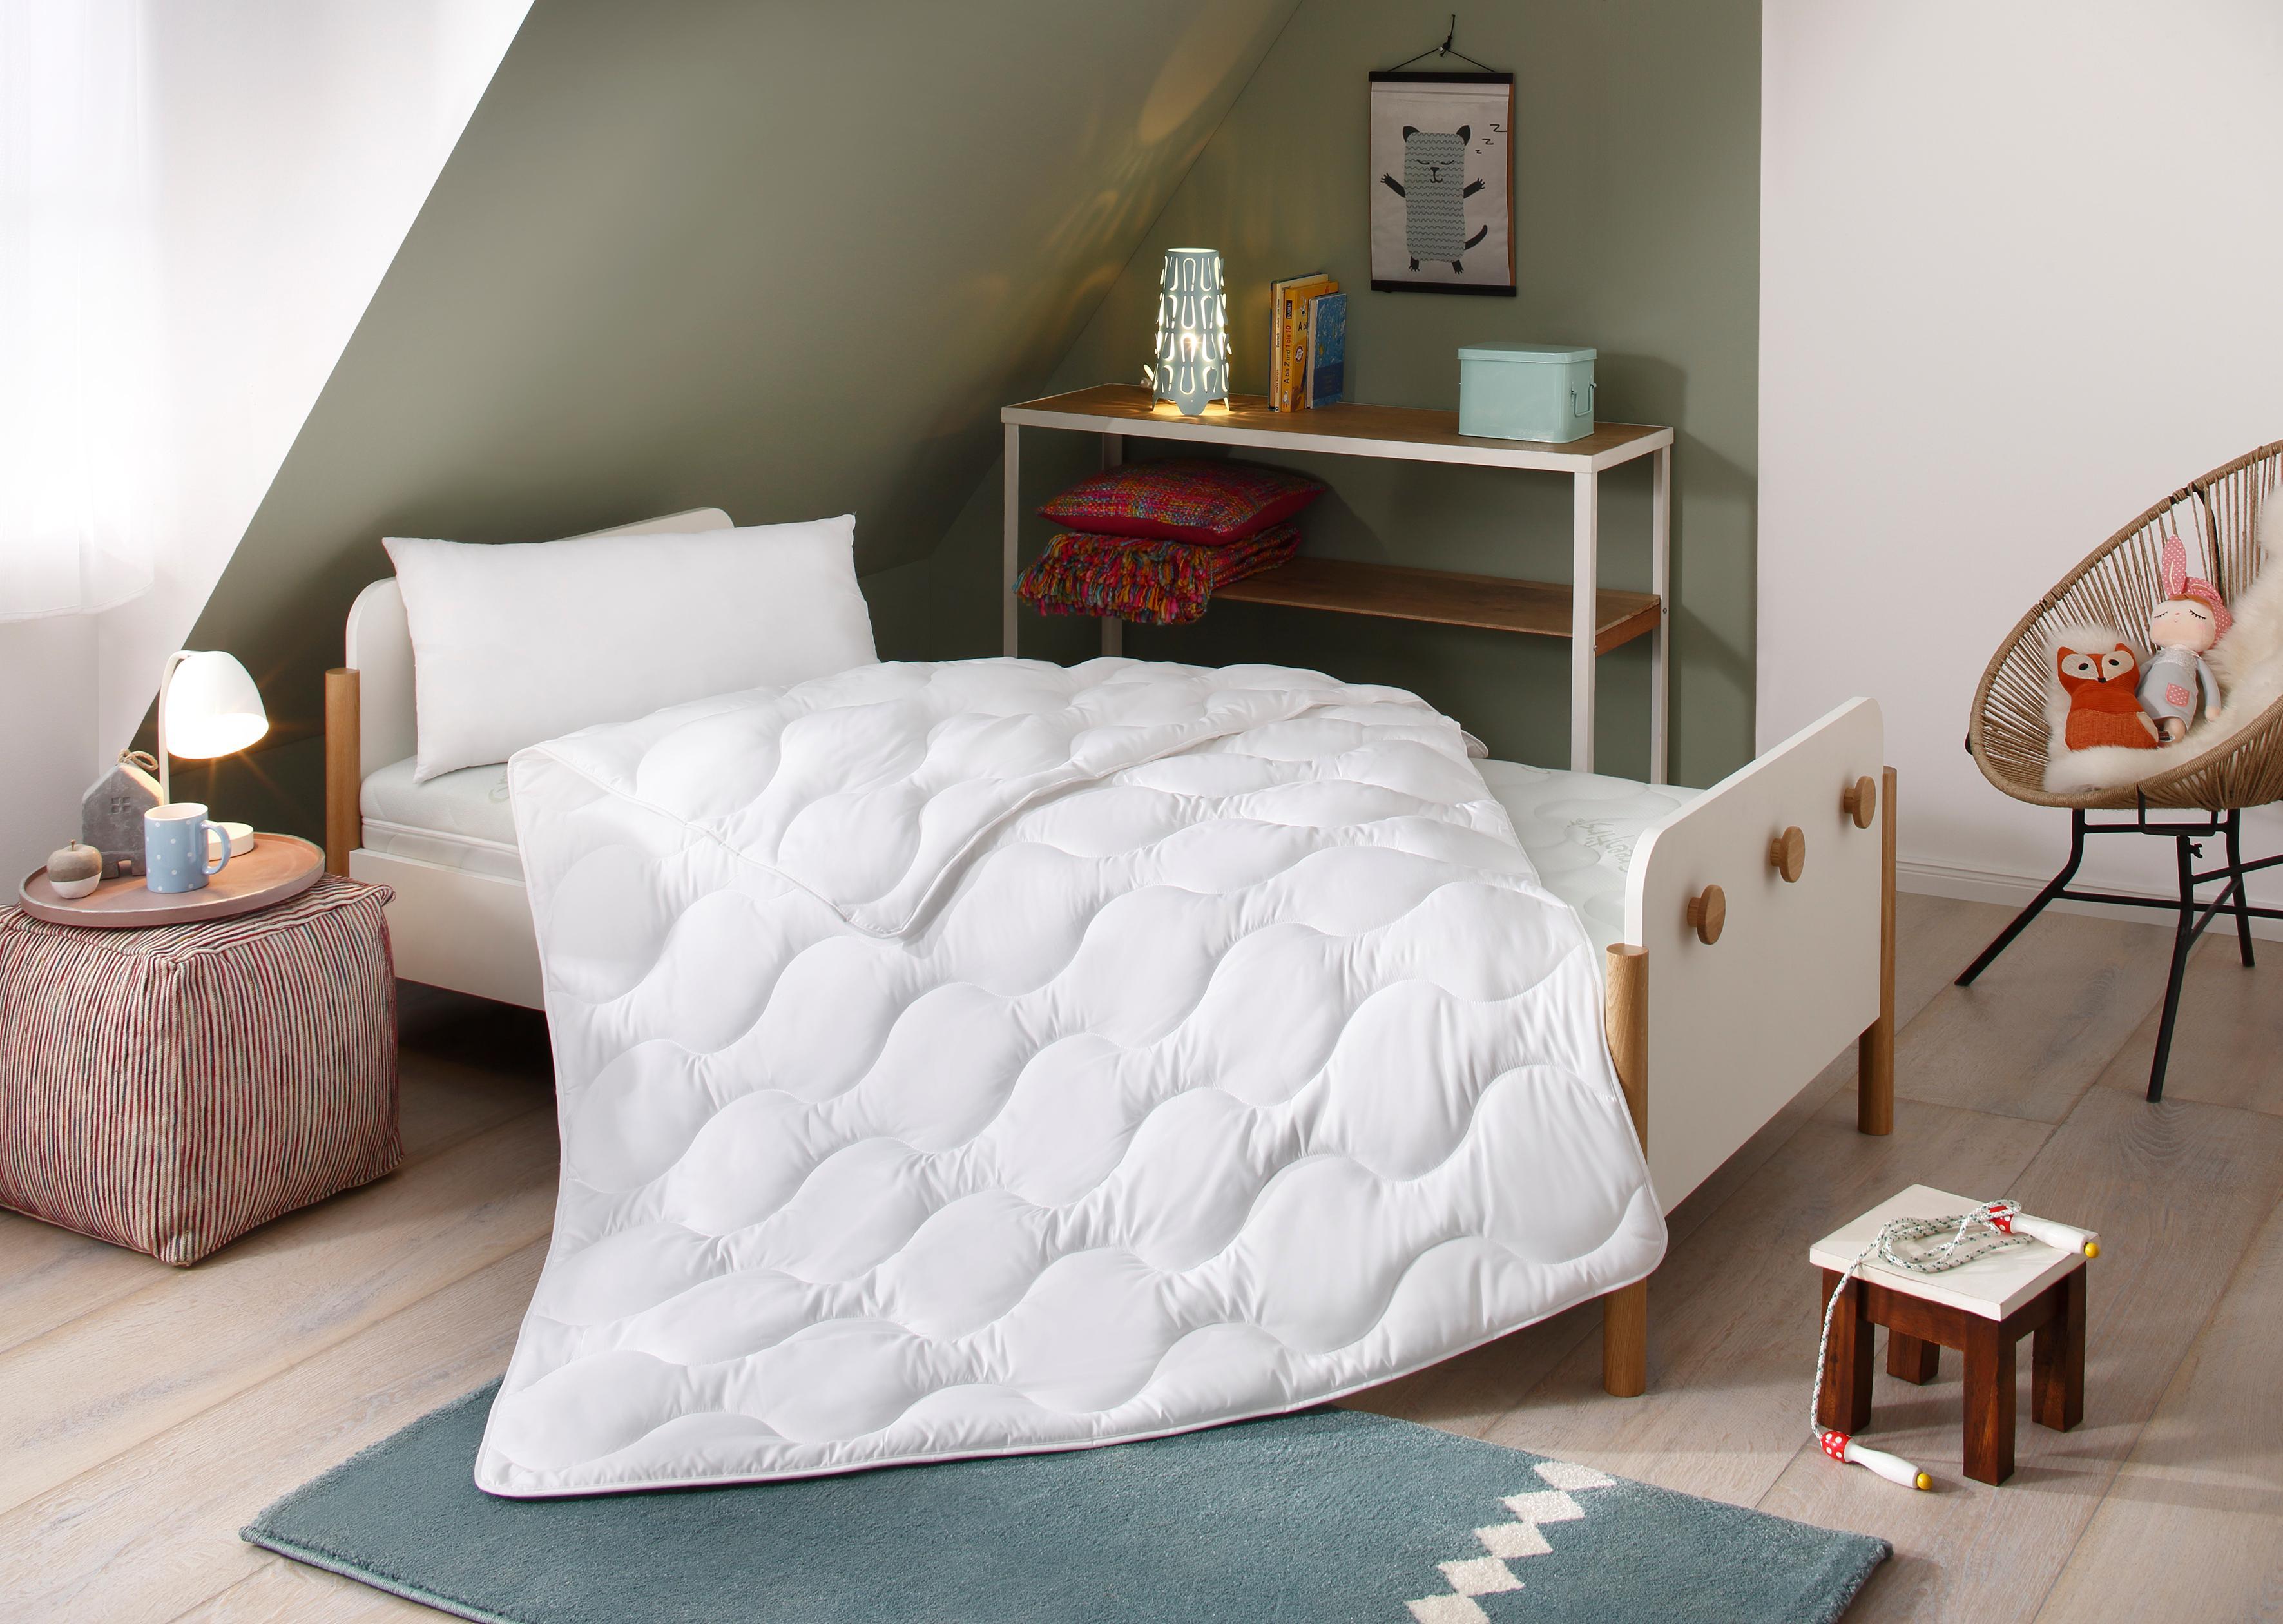 Kinderbettdecke + Kopfkissen Micro Lüttenhütt normal Füllung: Synthetik